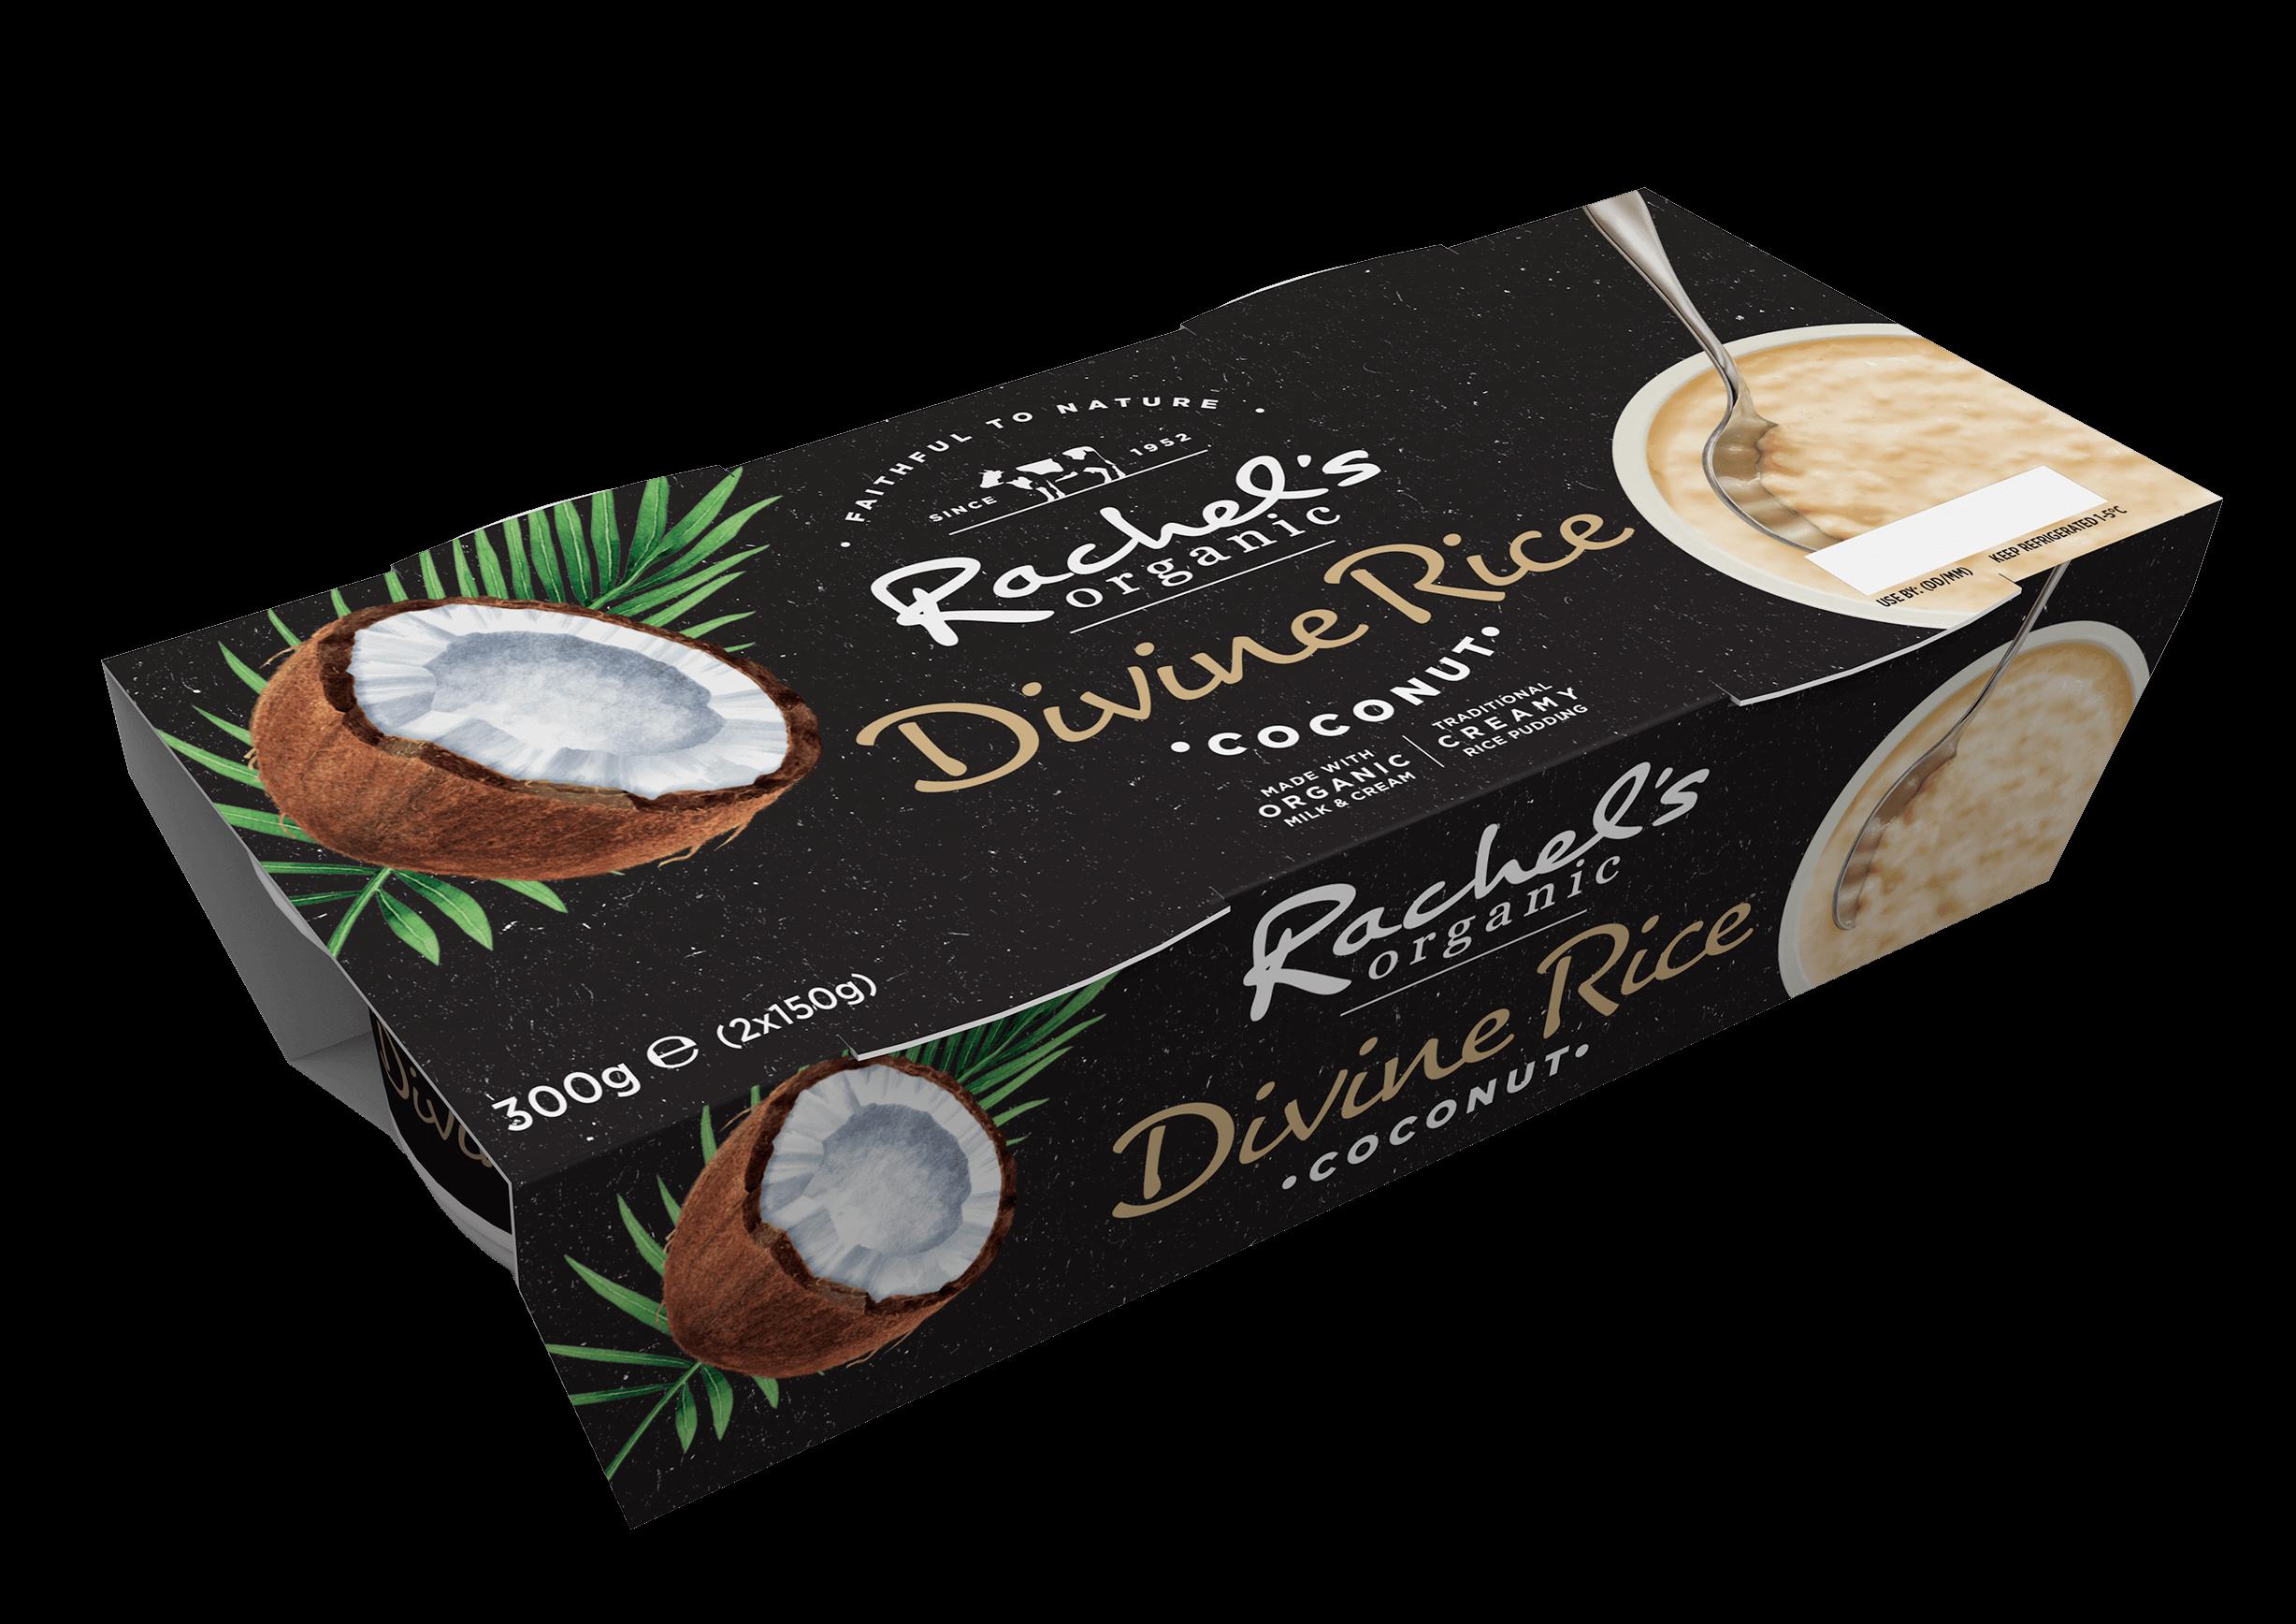 https://www.rachelsorganic.co.uk/wp-content/uploads/2019/12/3487130236191-Rachels-Divine-Rice-Coconut-2x150g.png